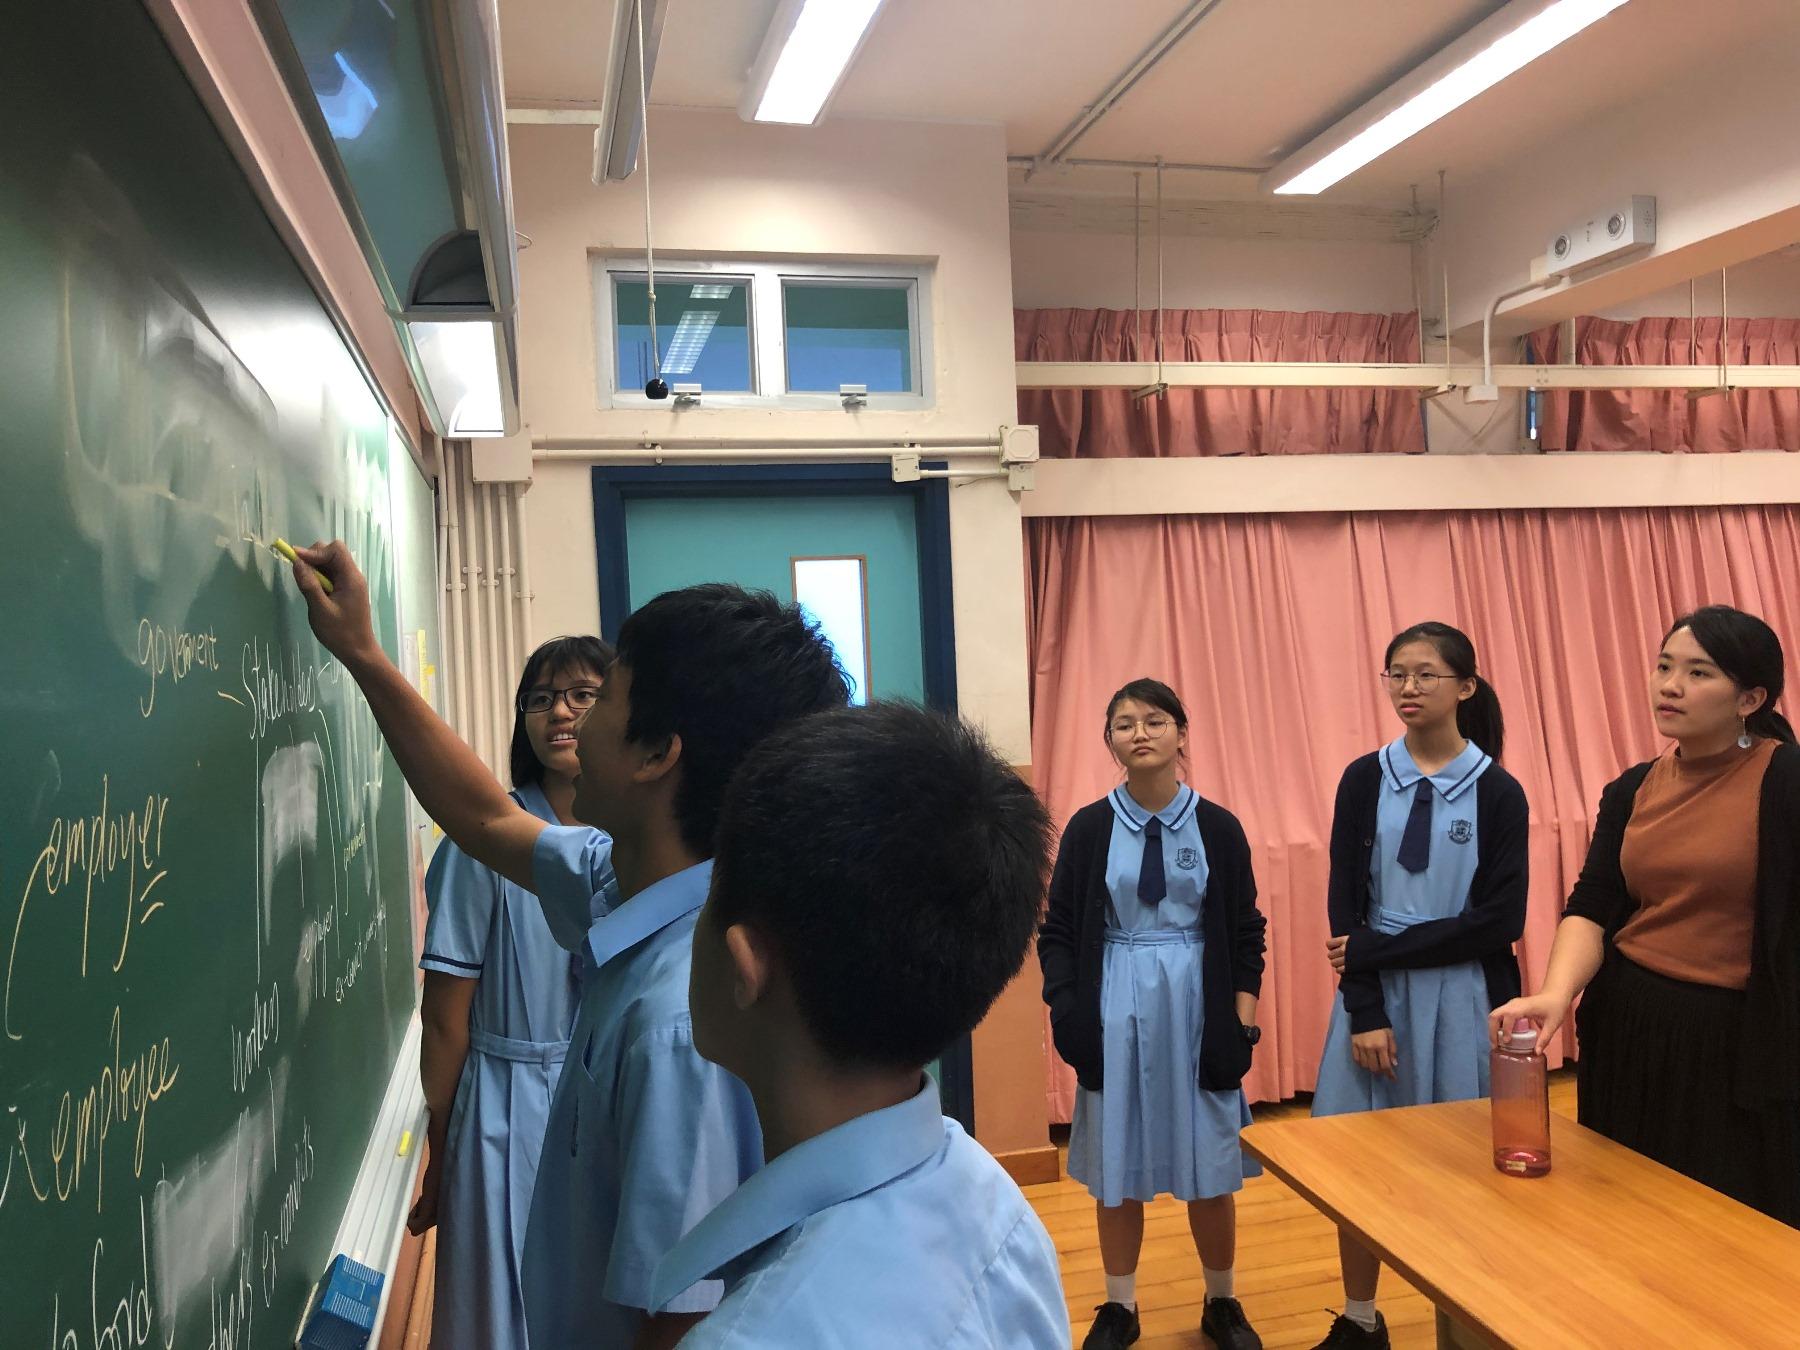 https://www.npc.edu.hk/sites/default/files/img_7432.jpg